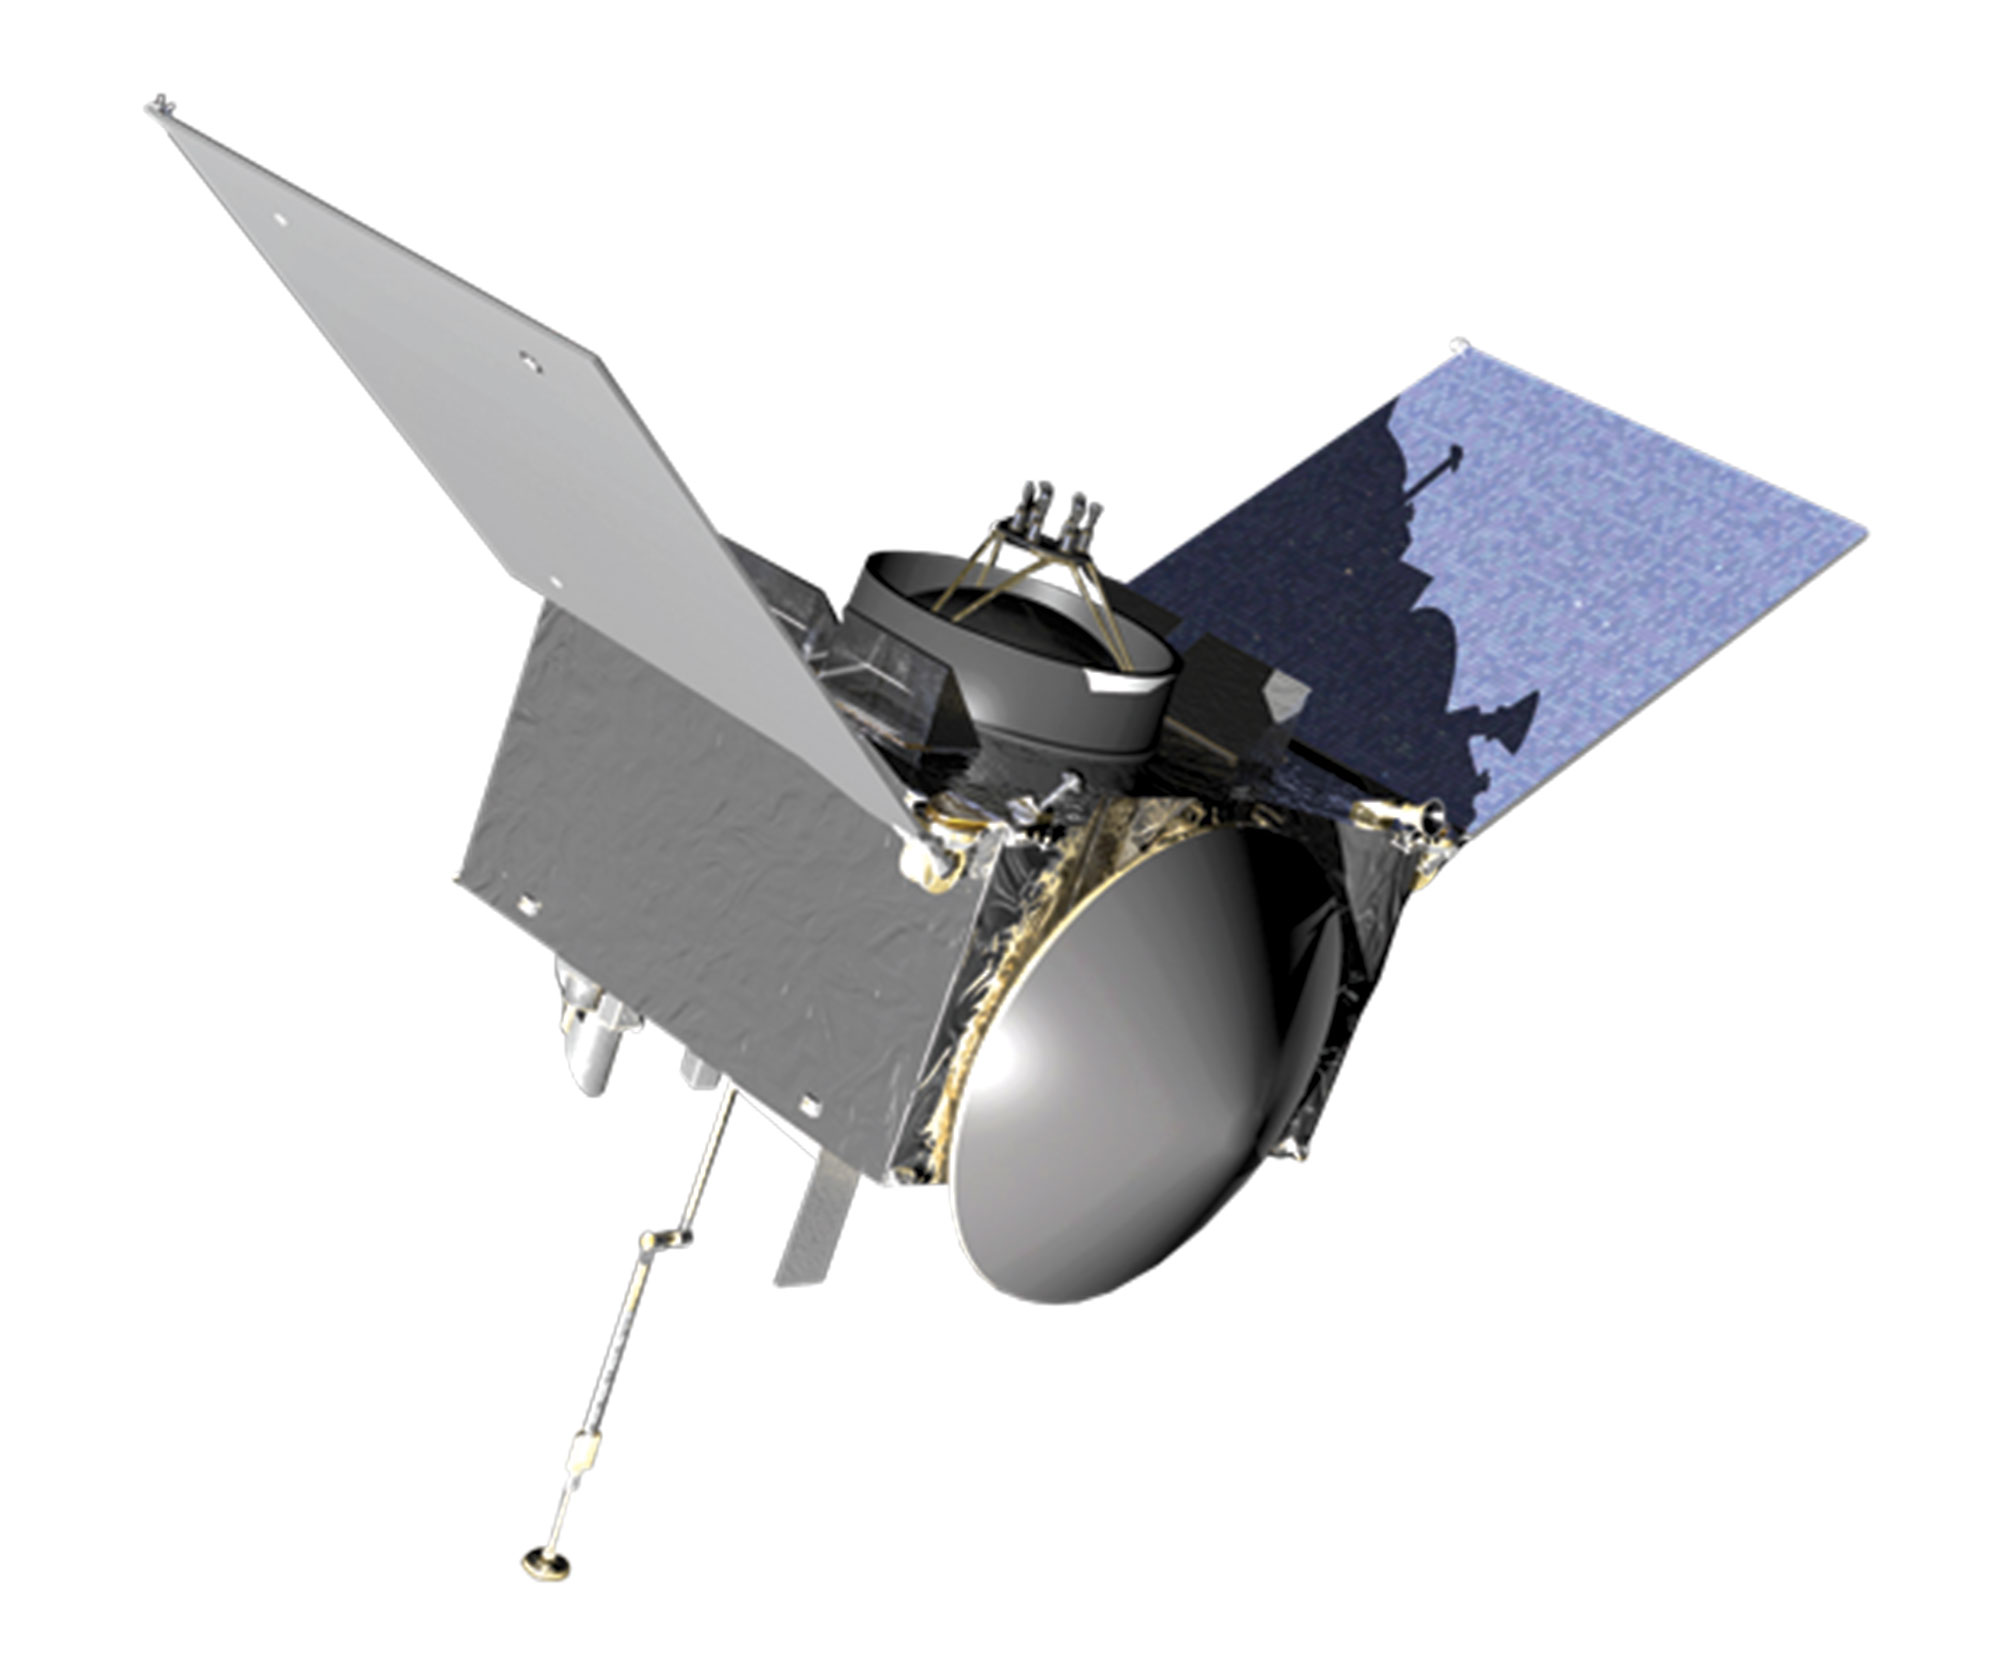 Photo courtesy Nasa /Goddard Space Flight Center